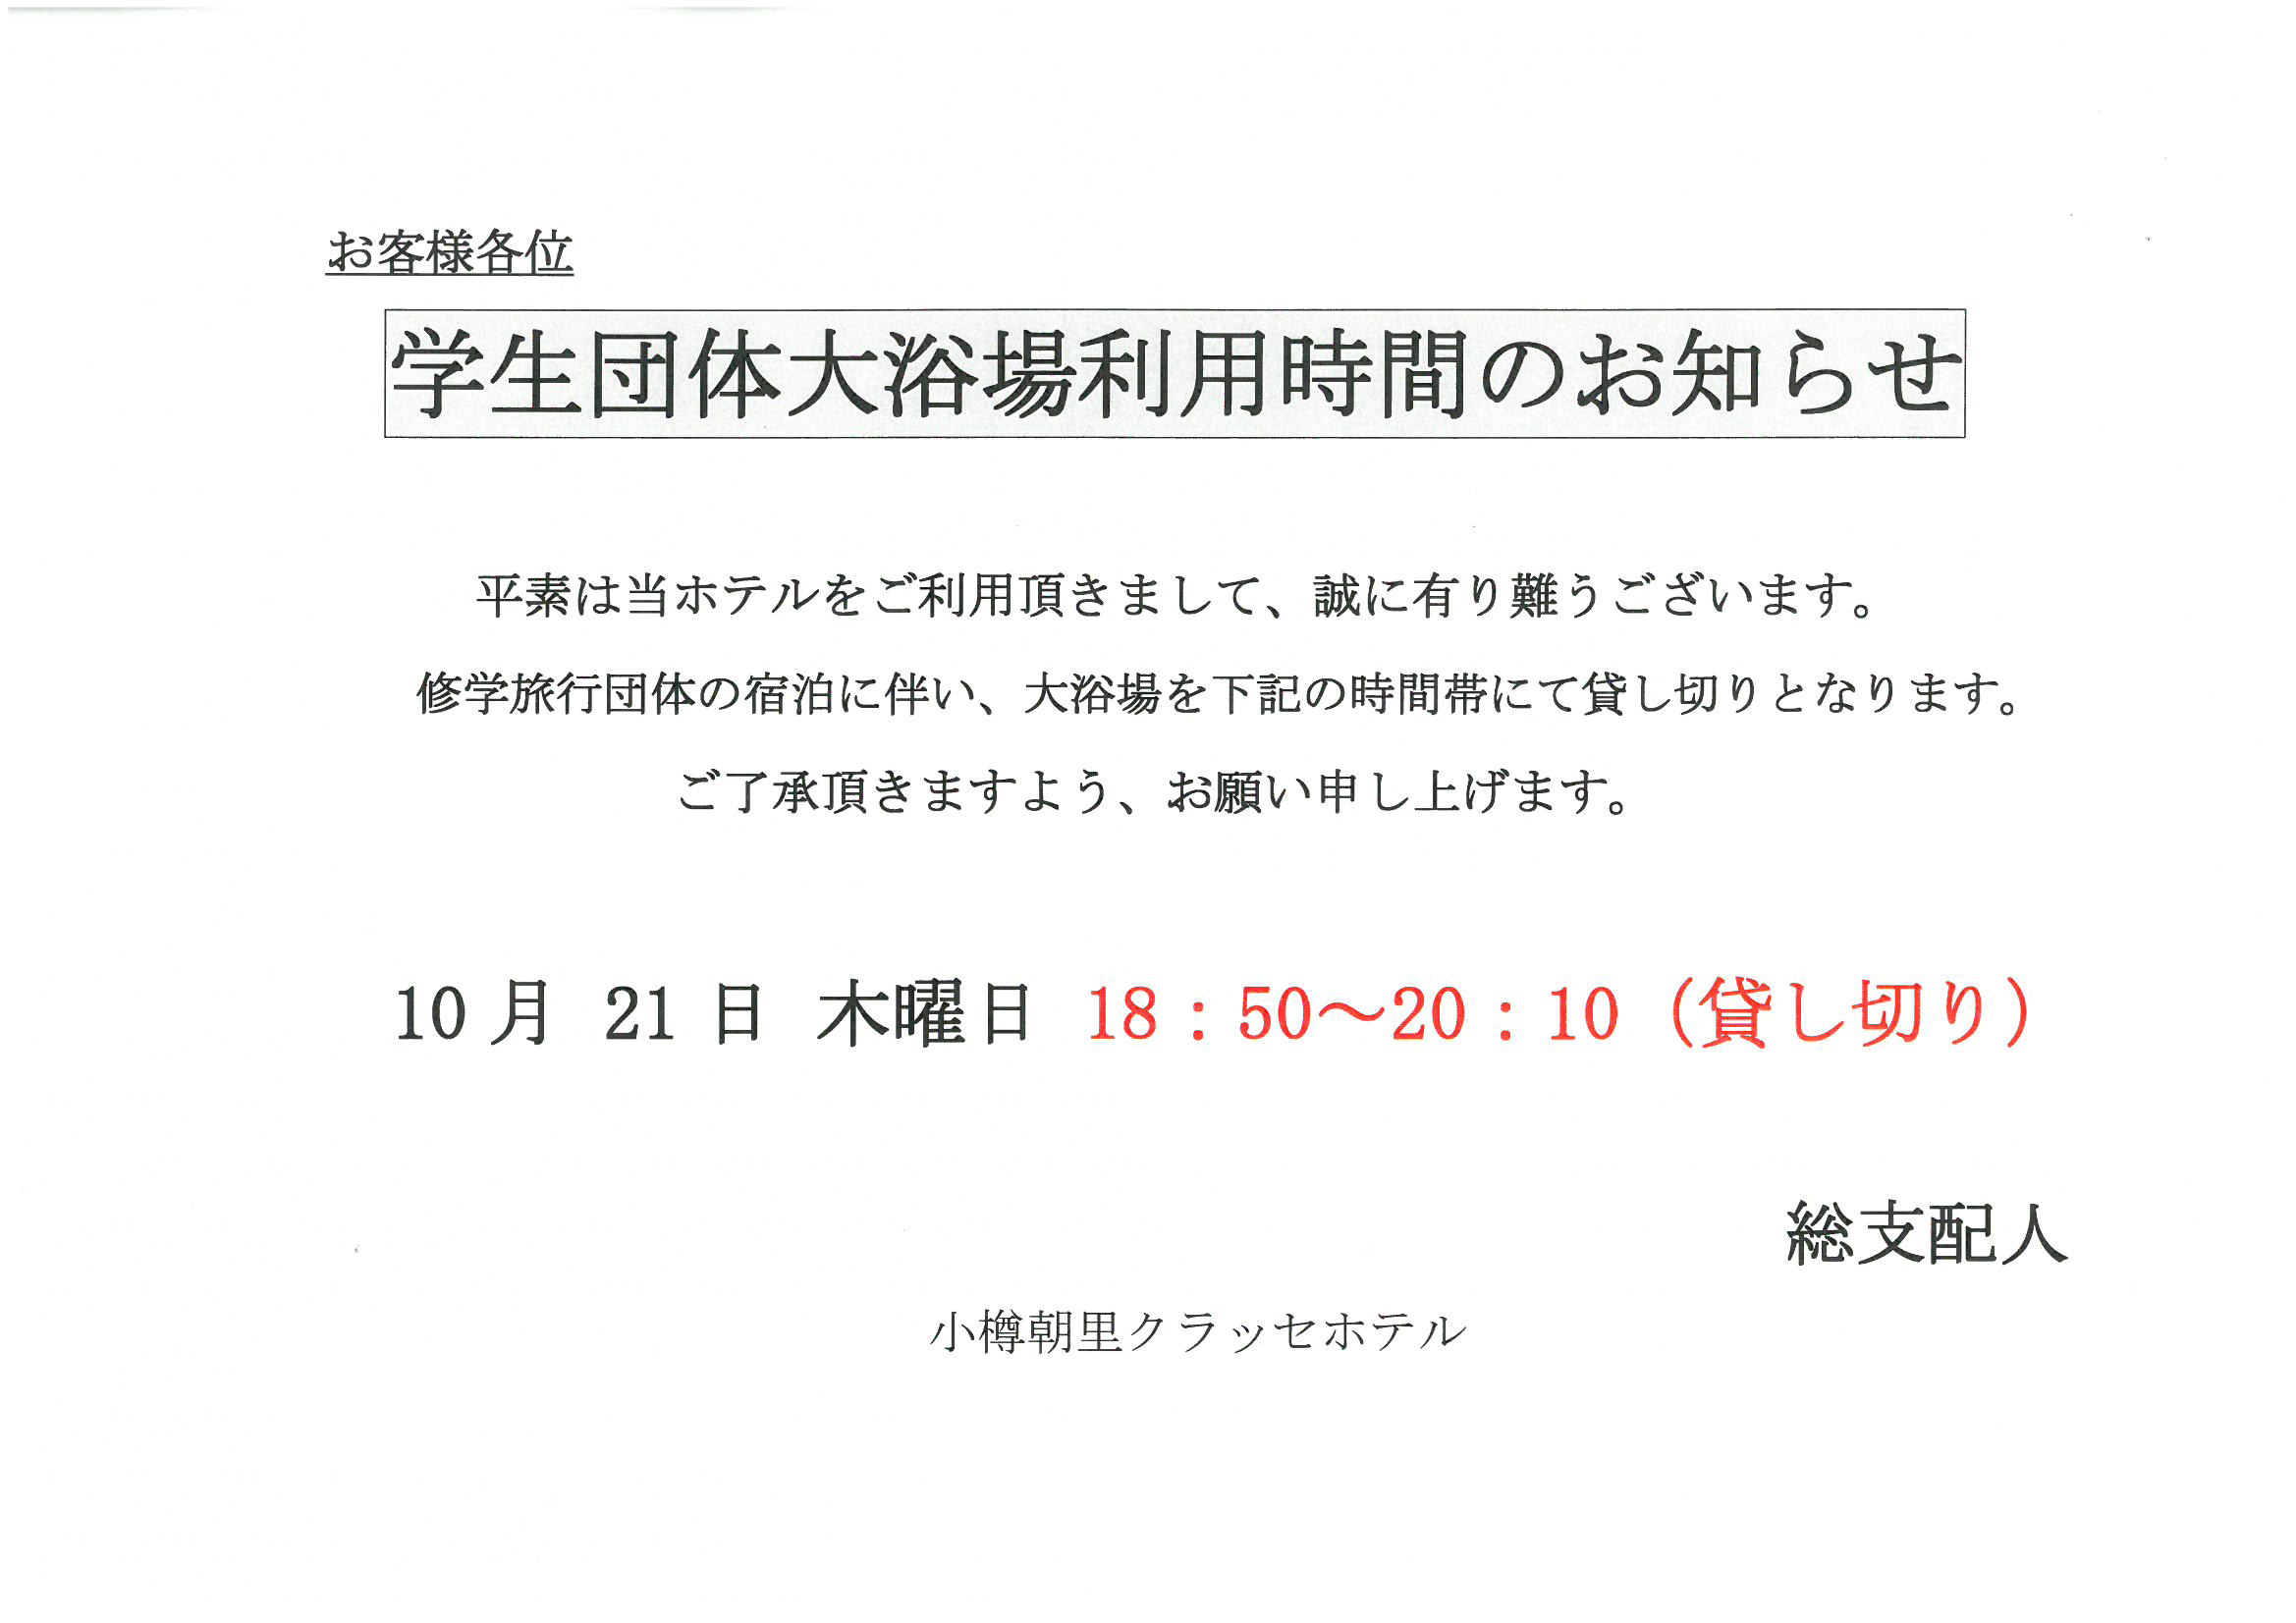 http://www.classe-hotel.com/topics/up_images/10.21.jpg